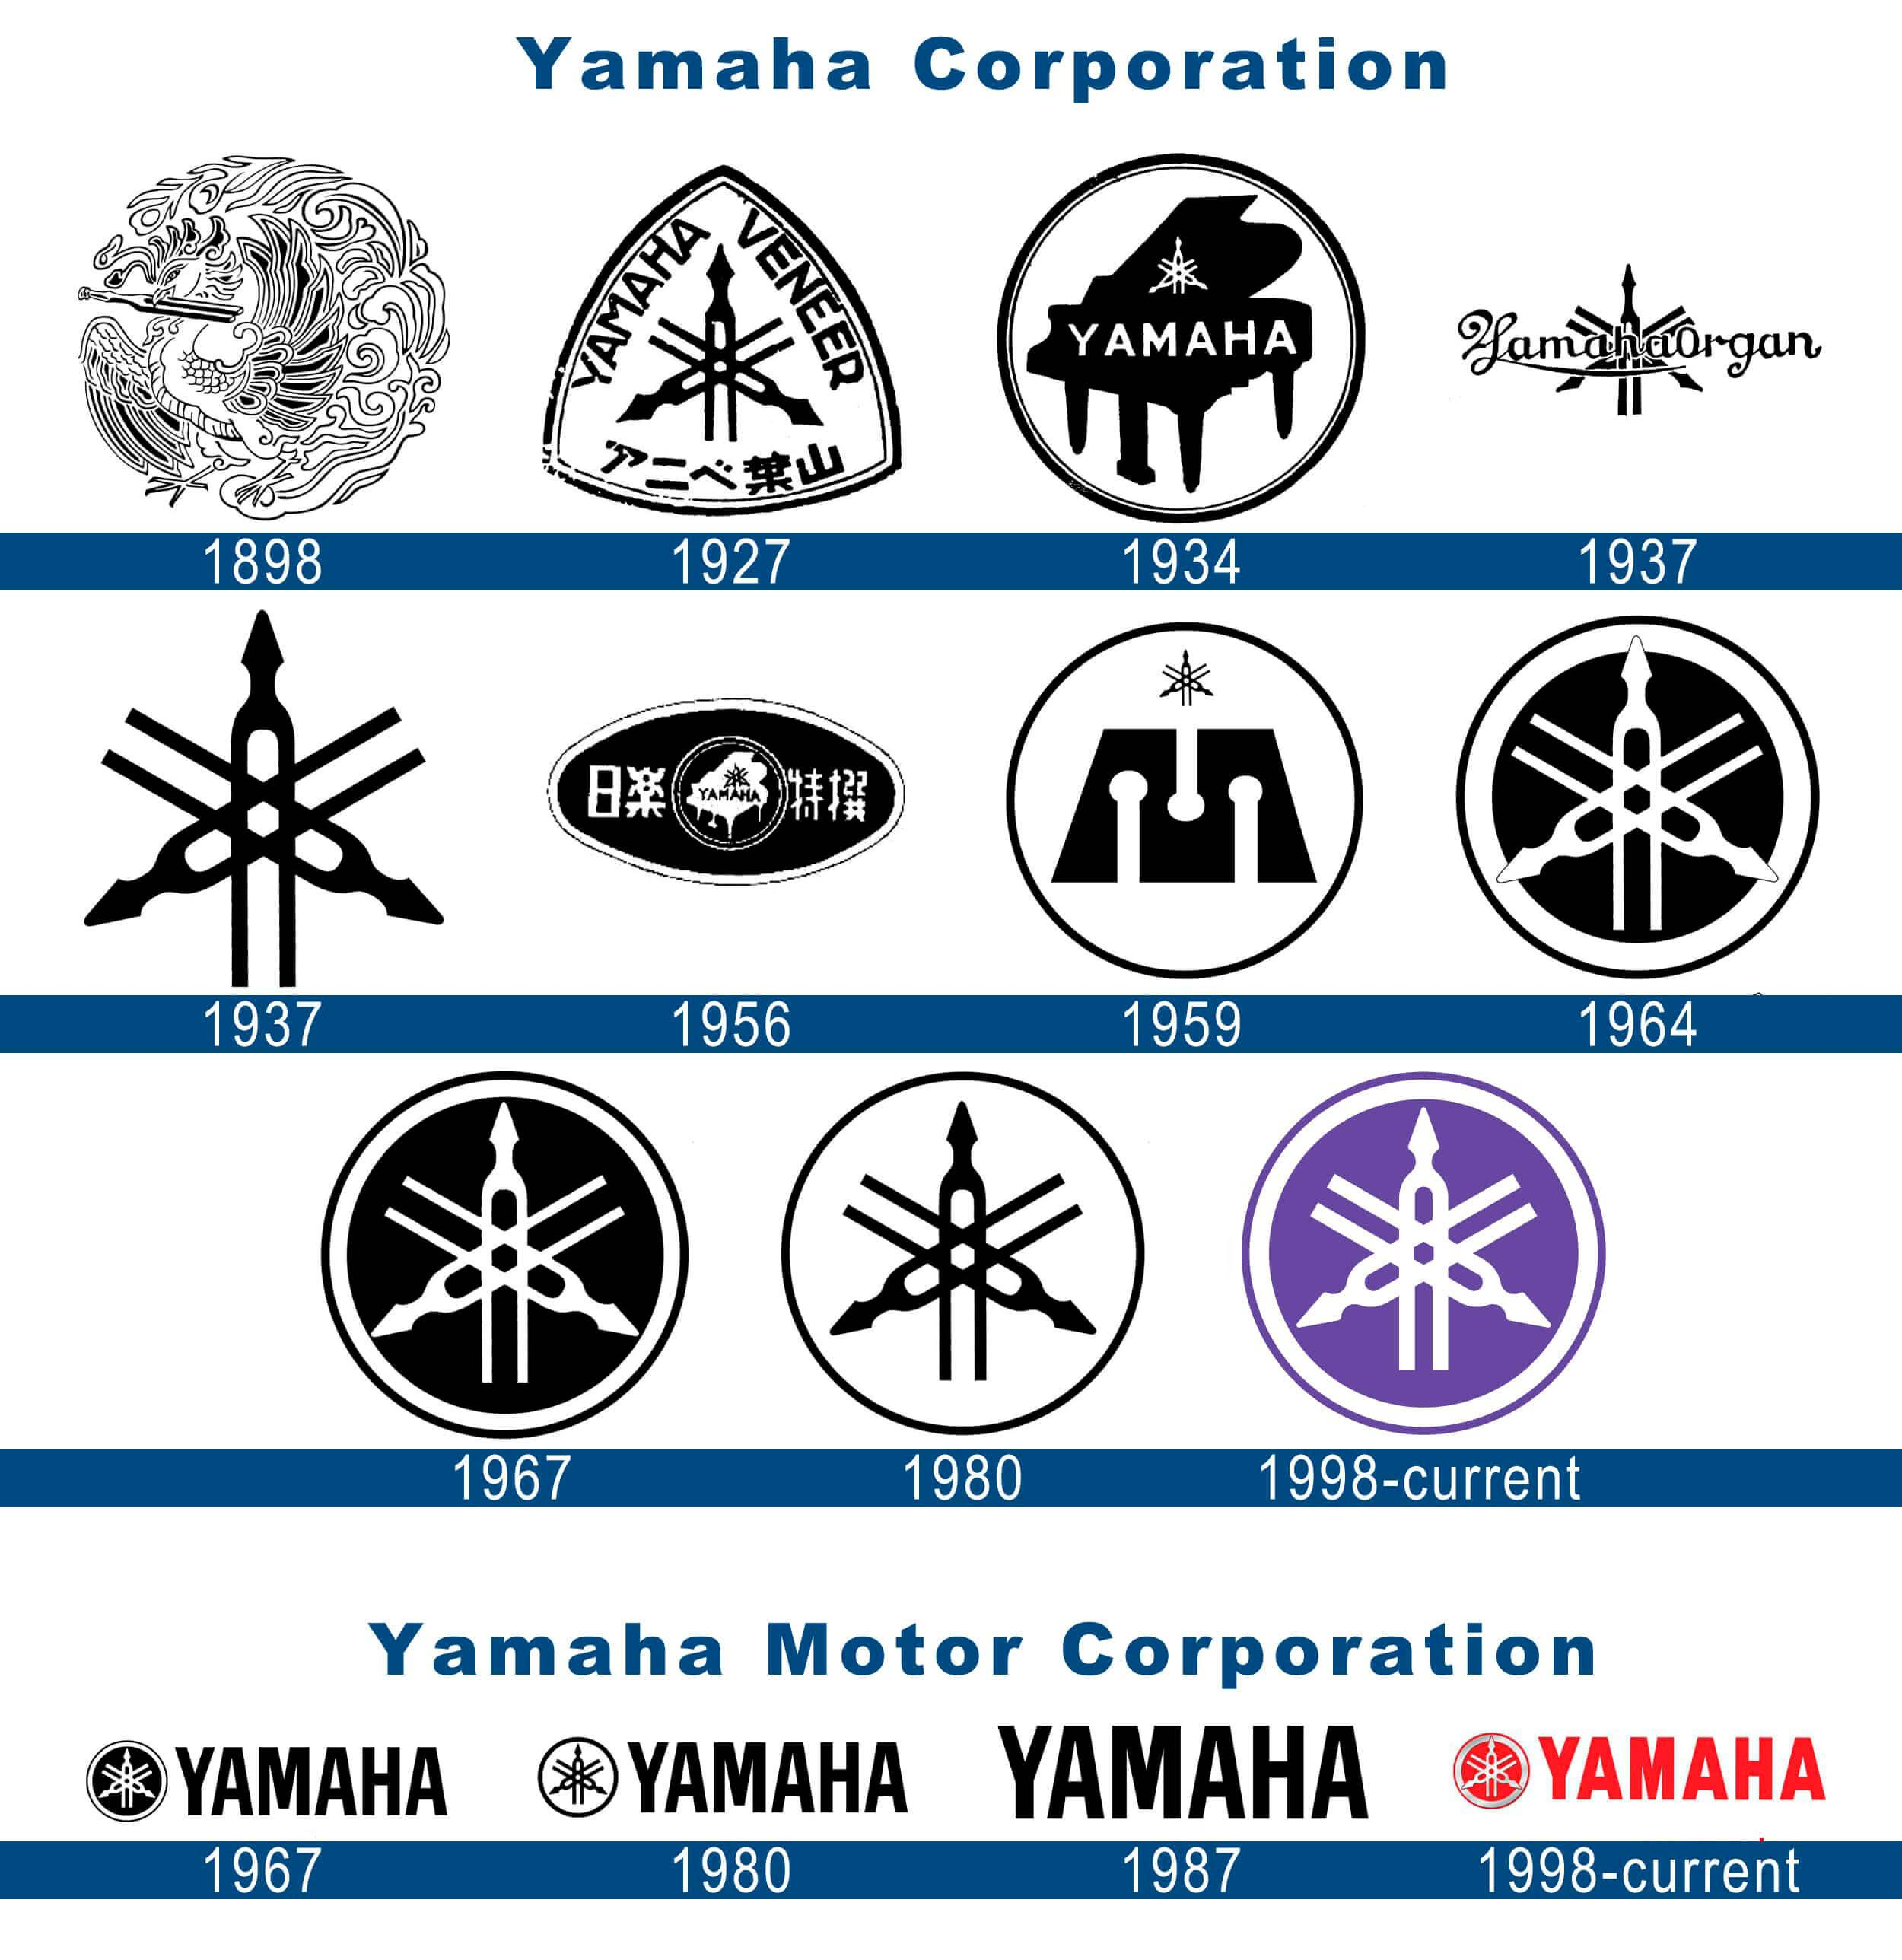 hight resolution of yamaha logo history yamaha logo yamaha motorcycles cars and motorcycles motorcycle logo